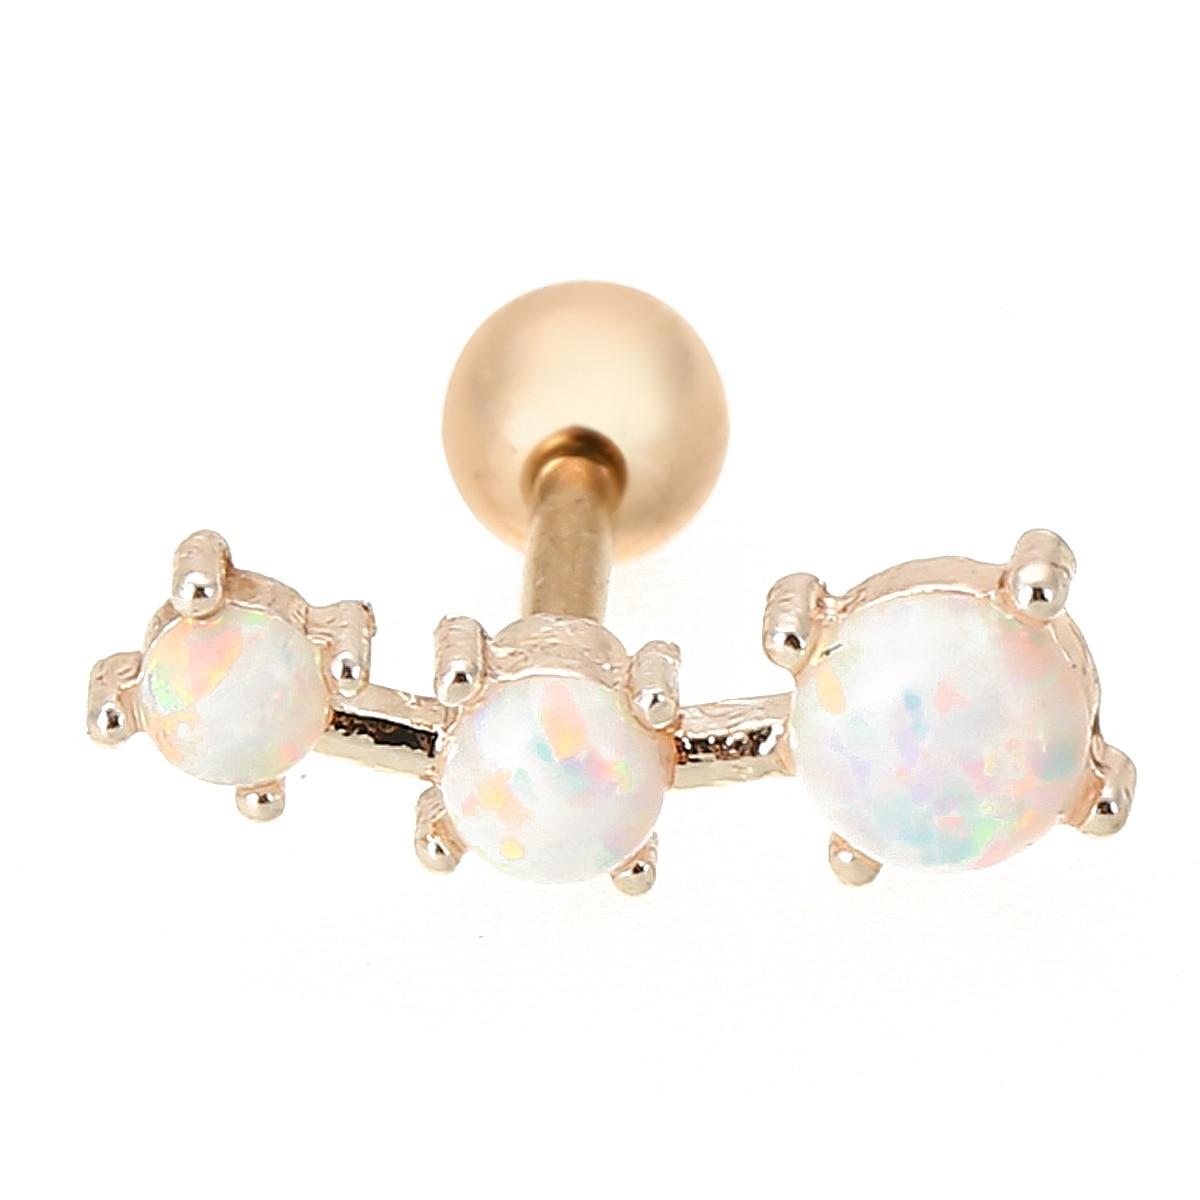 Shellhard Fashion Ear Piercing Jewelry Sexy Opal Crystal Cartilage Tragus Bar Barbell Ear Helix Tragus Earing 16g Body Jewellery